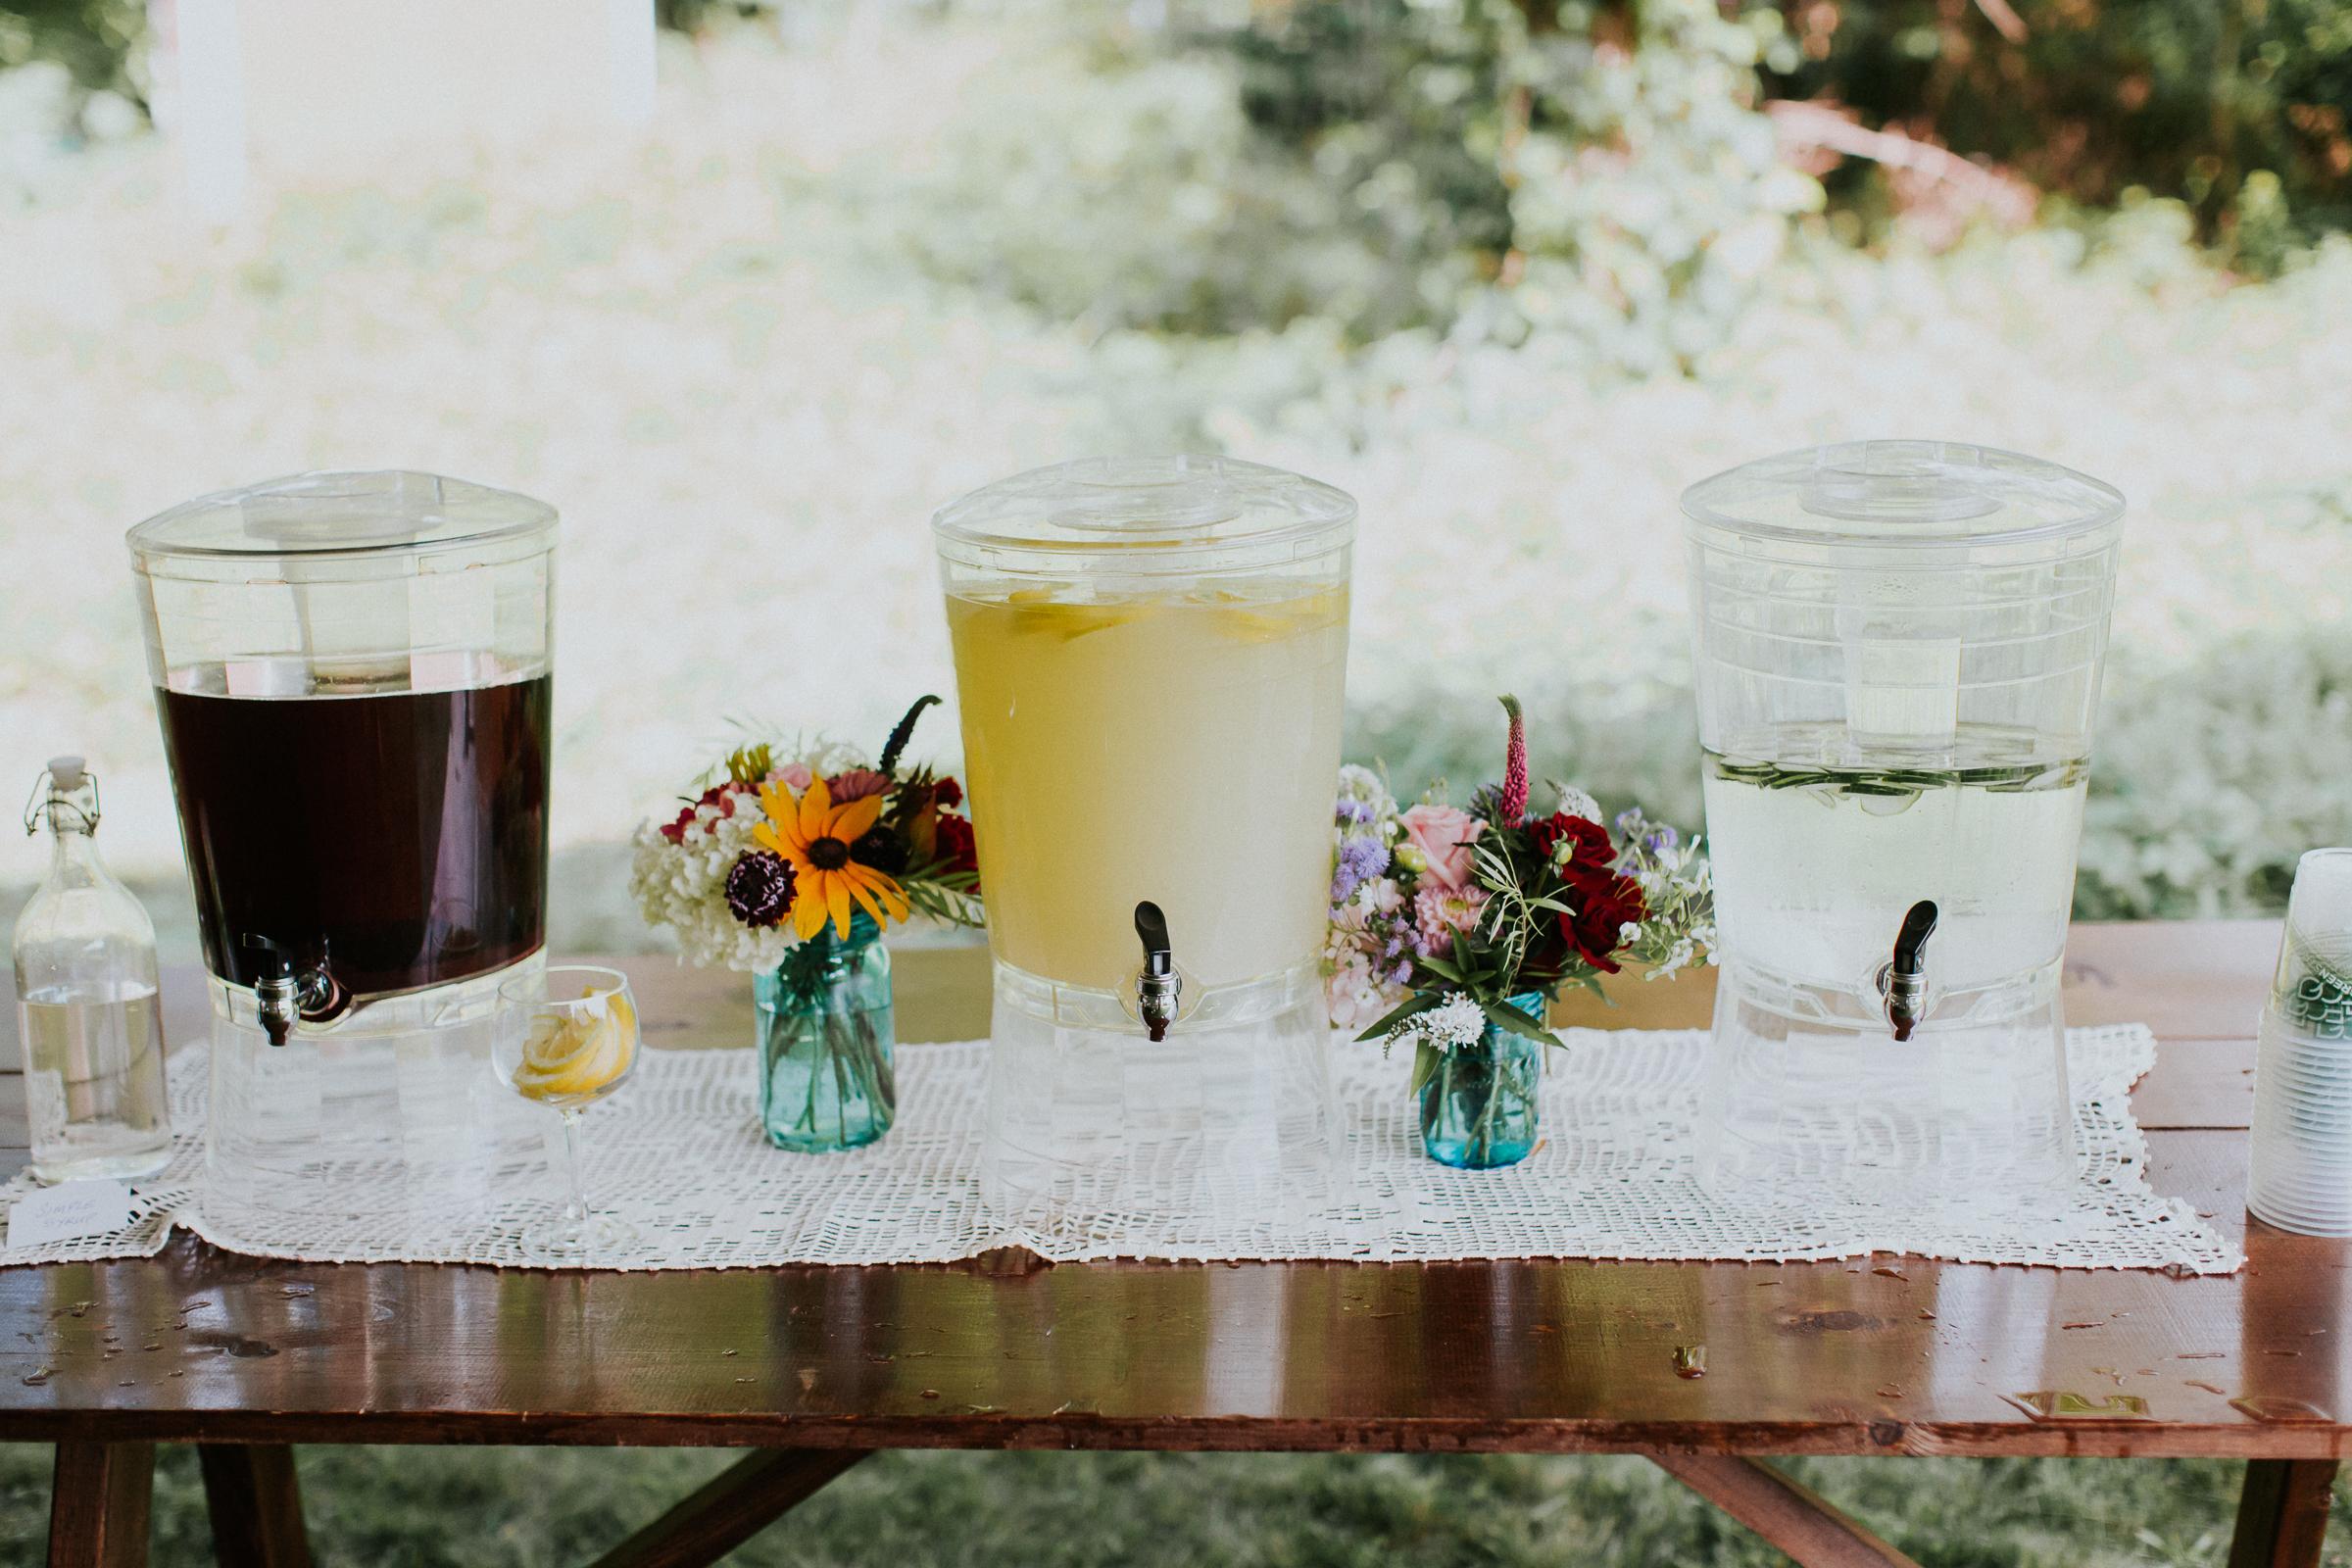 Backyard-Intimate-Adventurous-Destination-Wedding-Darien-Connecticut-Documentary-Wedding-Photography-65.jpg